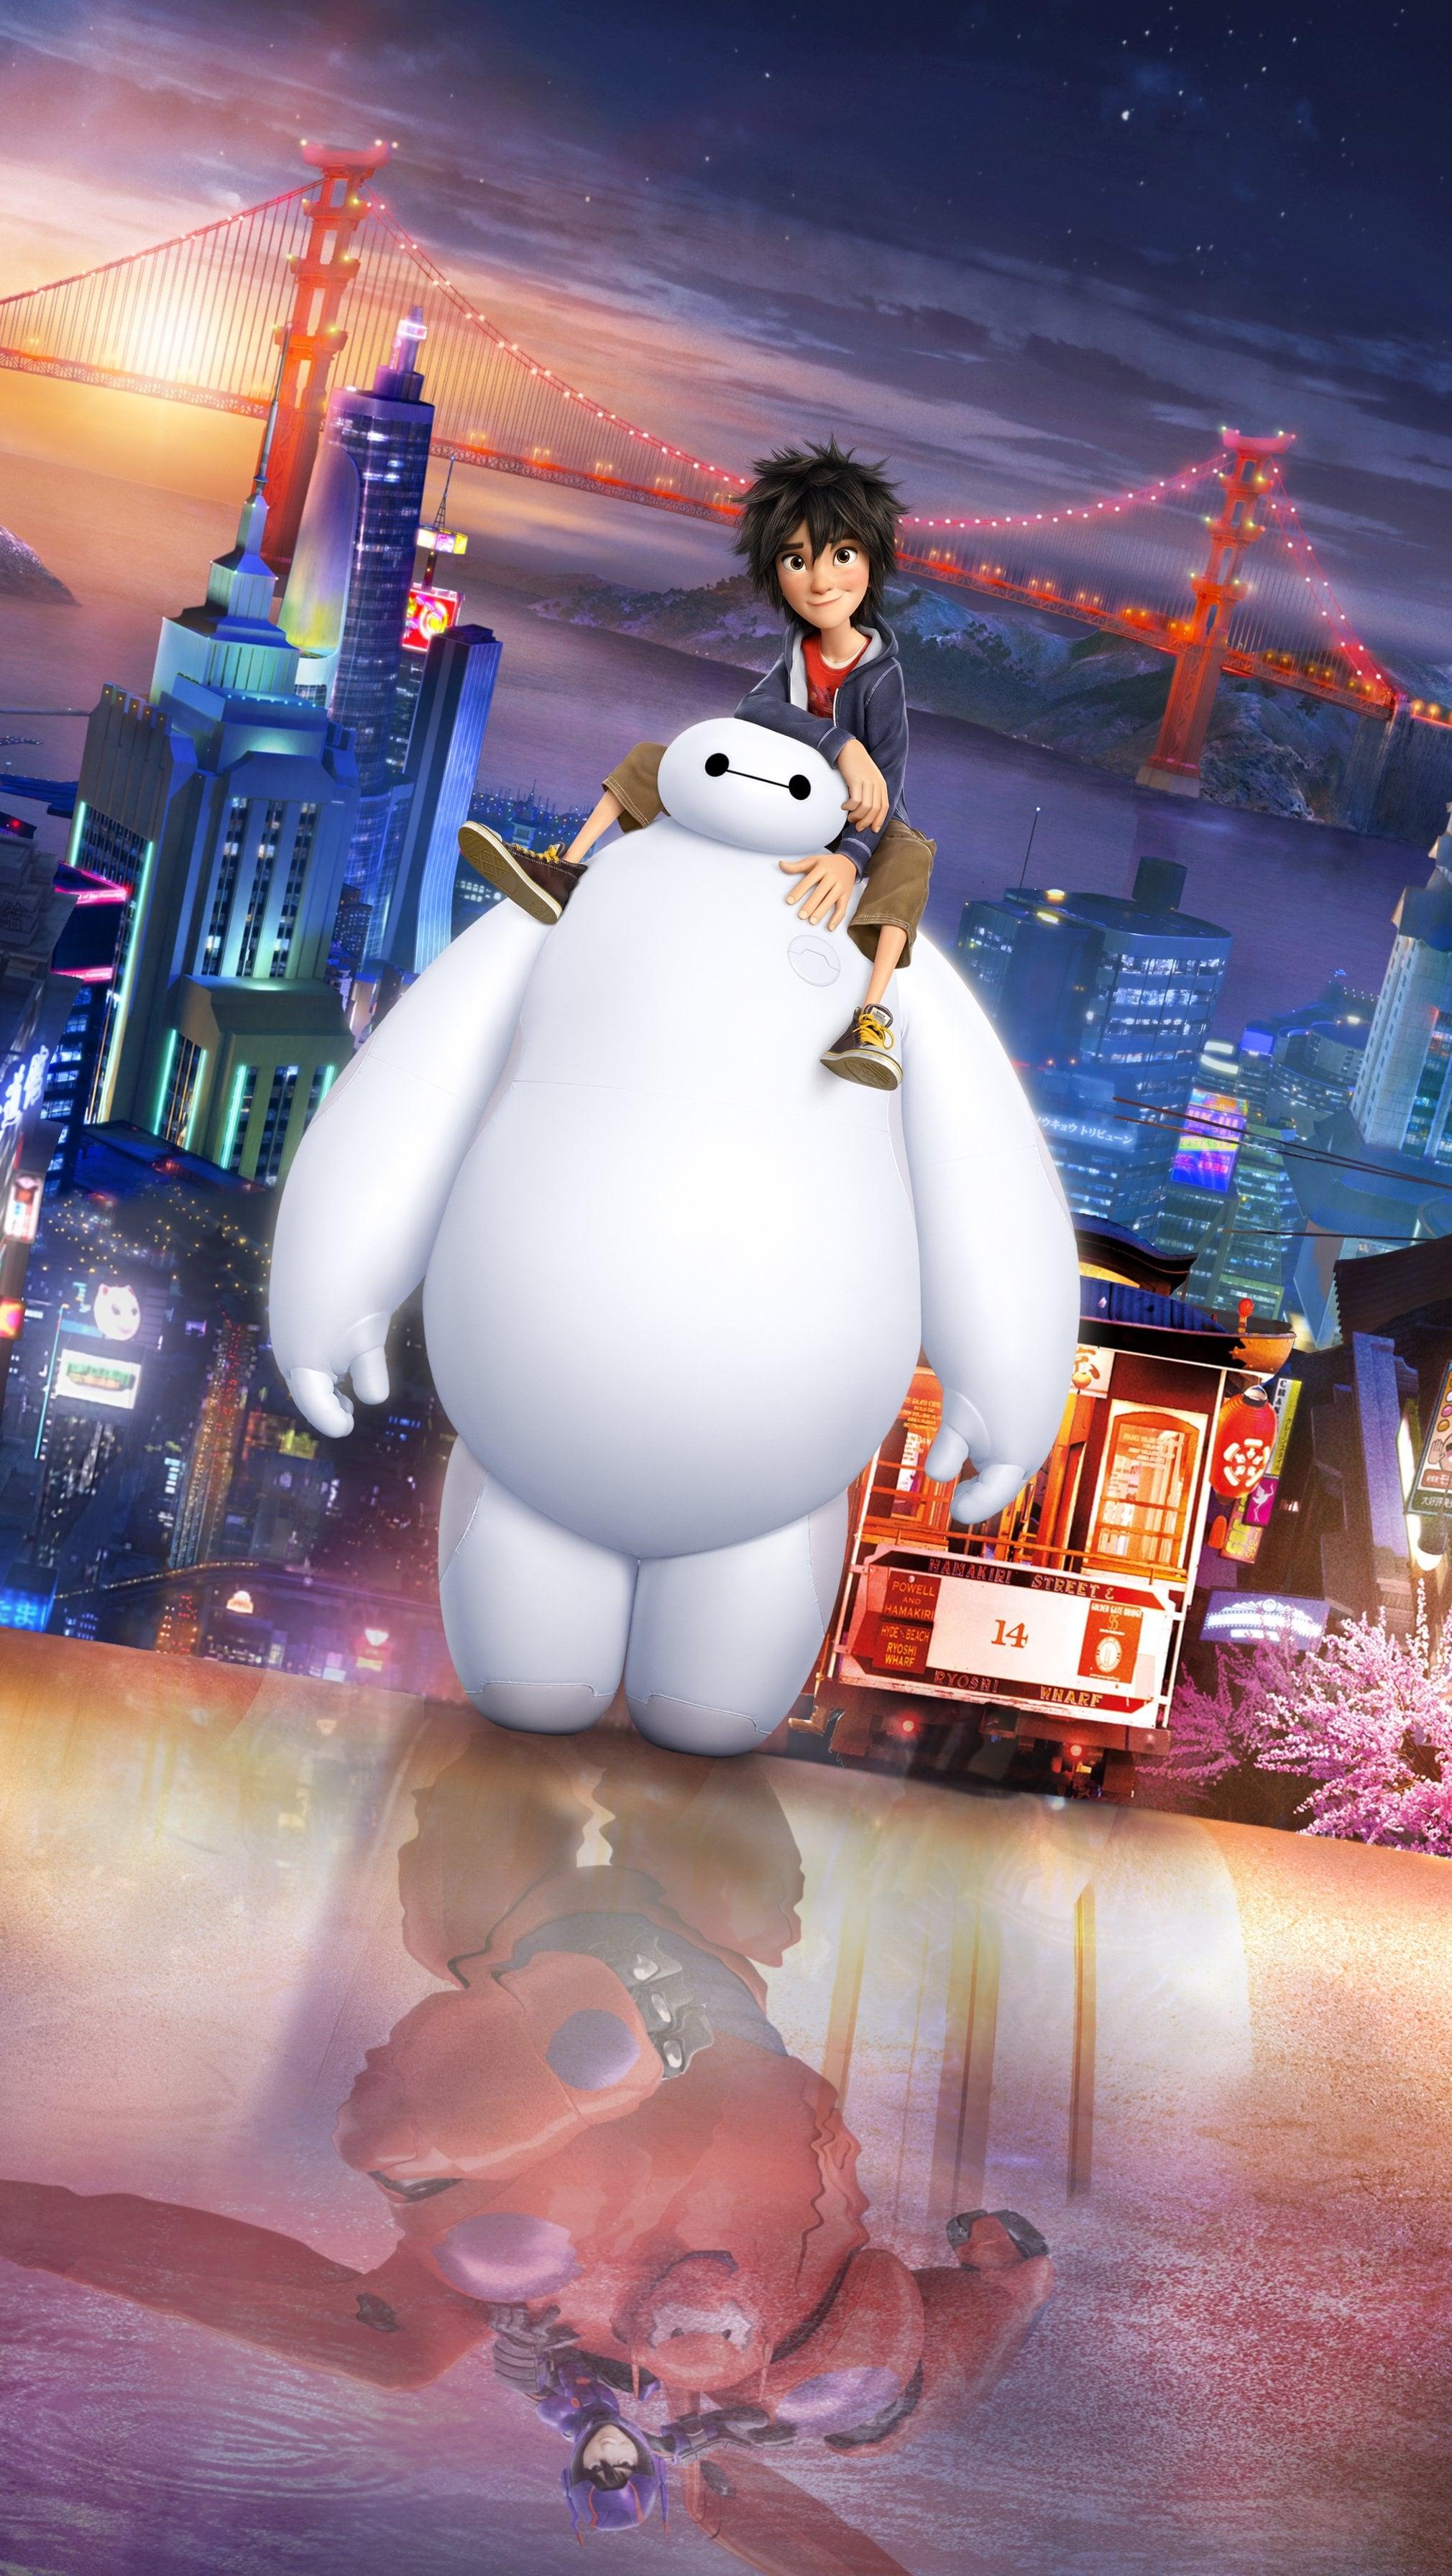 Baymax from Big Hero 6 (Disney)